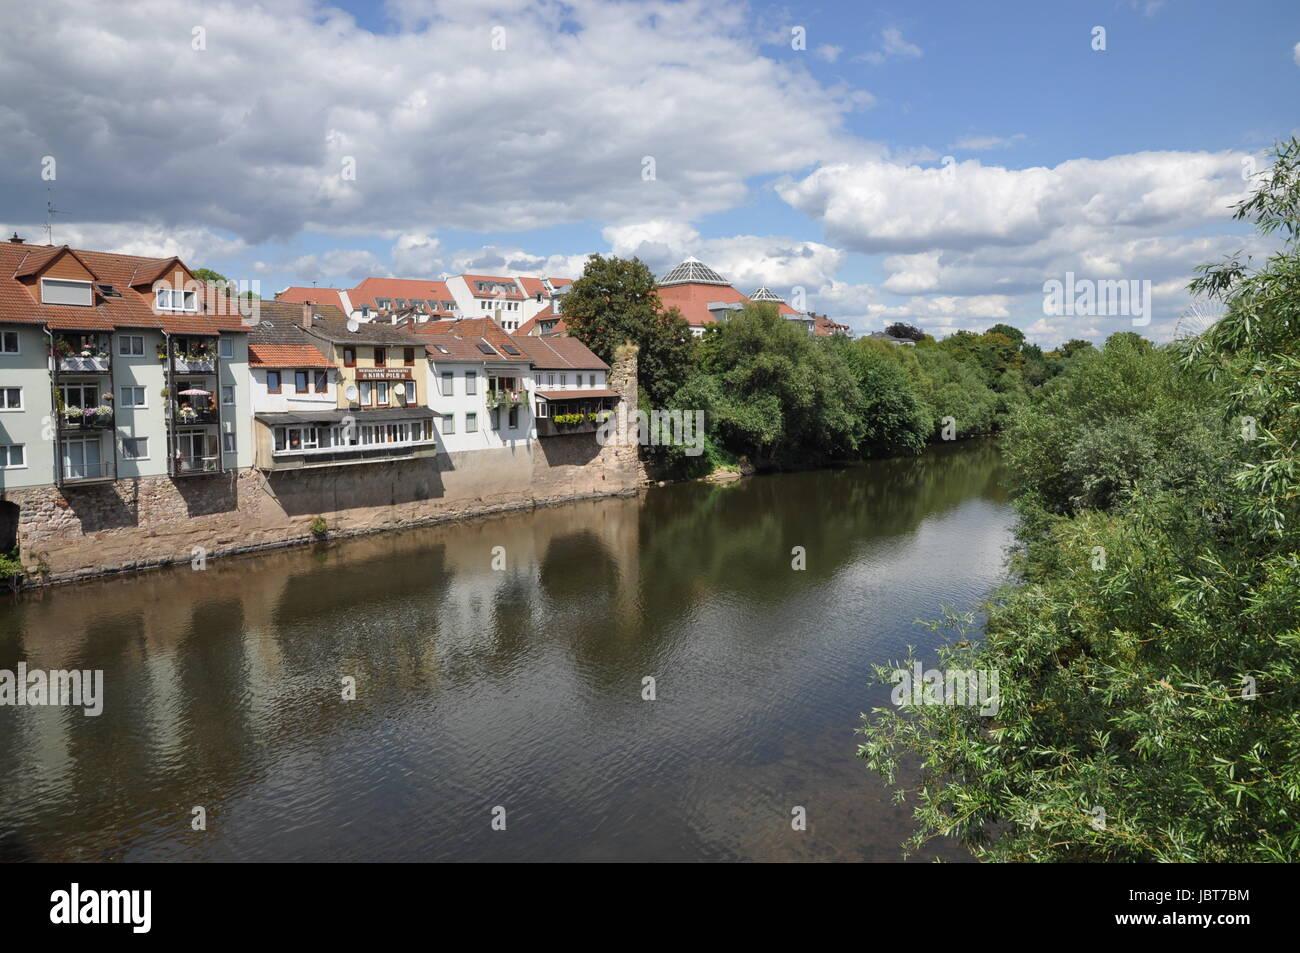 Nahe Fluss Photos & Nahe Fluss Images - Alamy